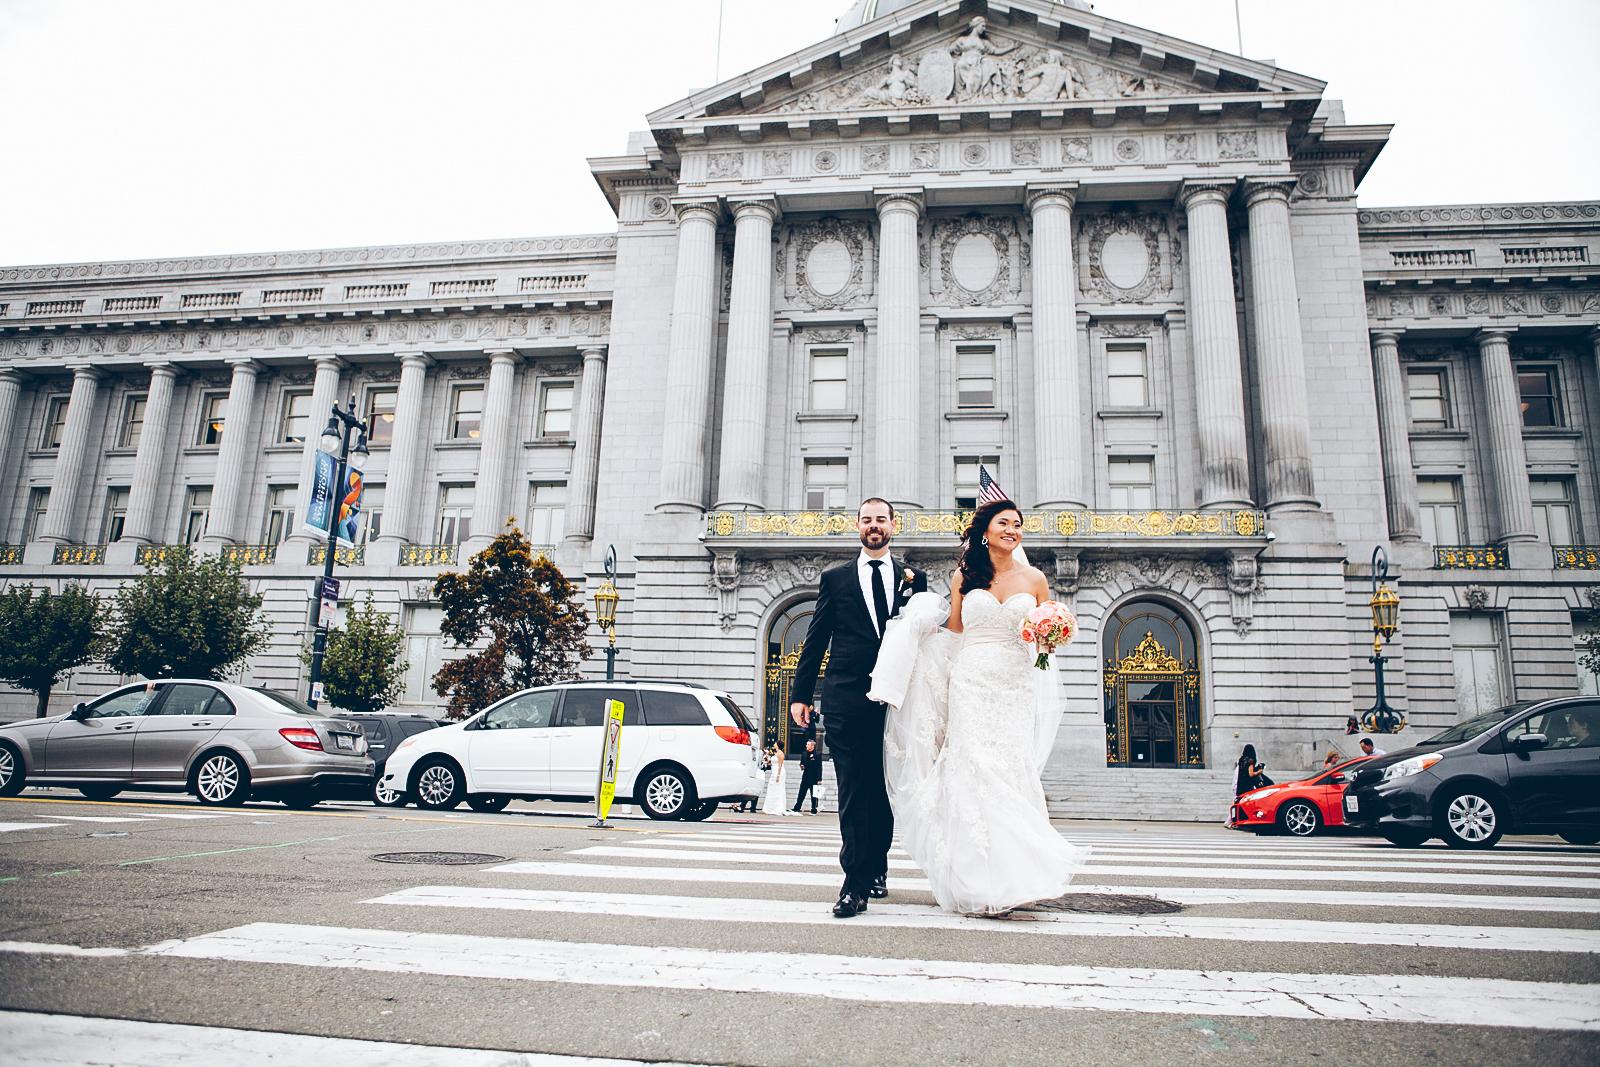 San_francisco_city_hall_wedding_photography_meegan_travis_ebony_siovhan_bokeh_photography_58.jpg